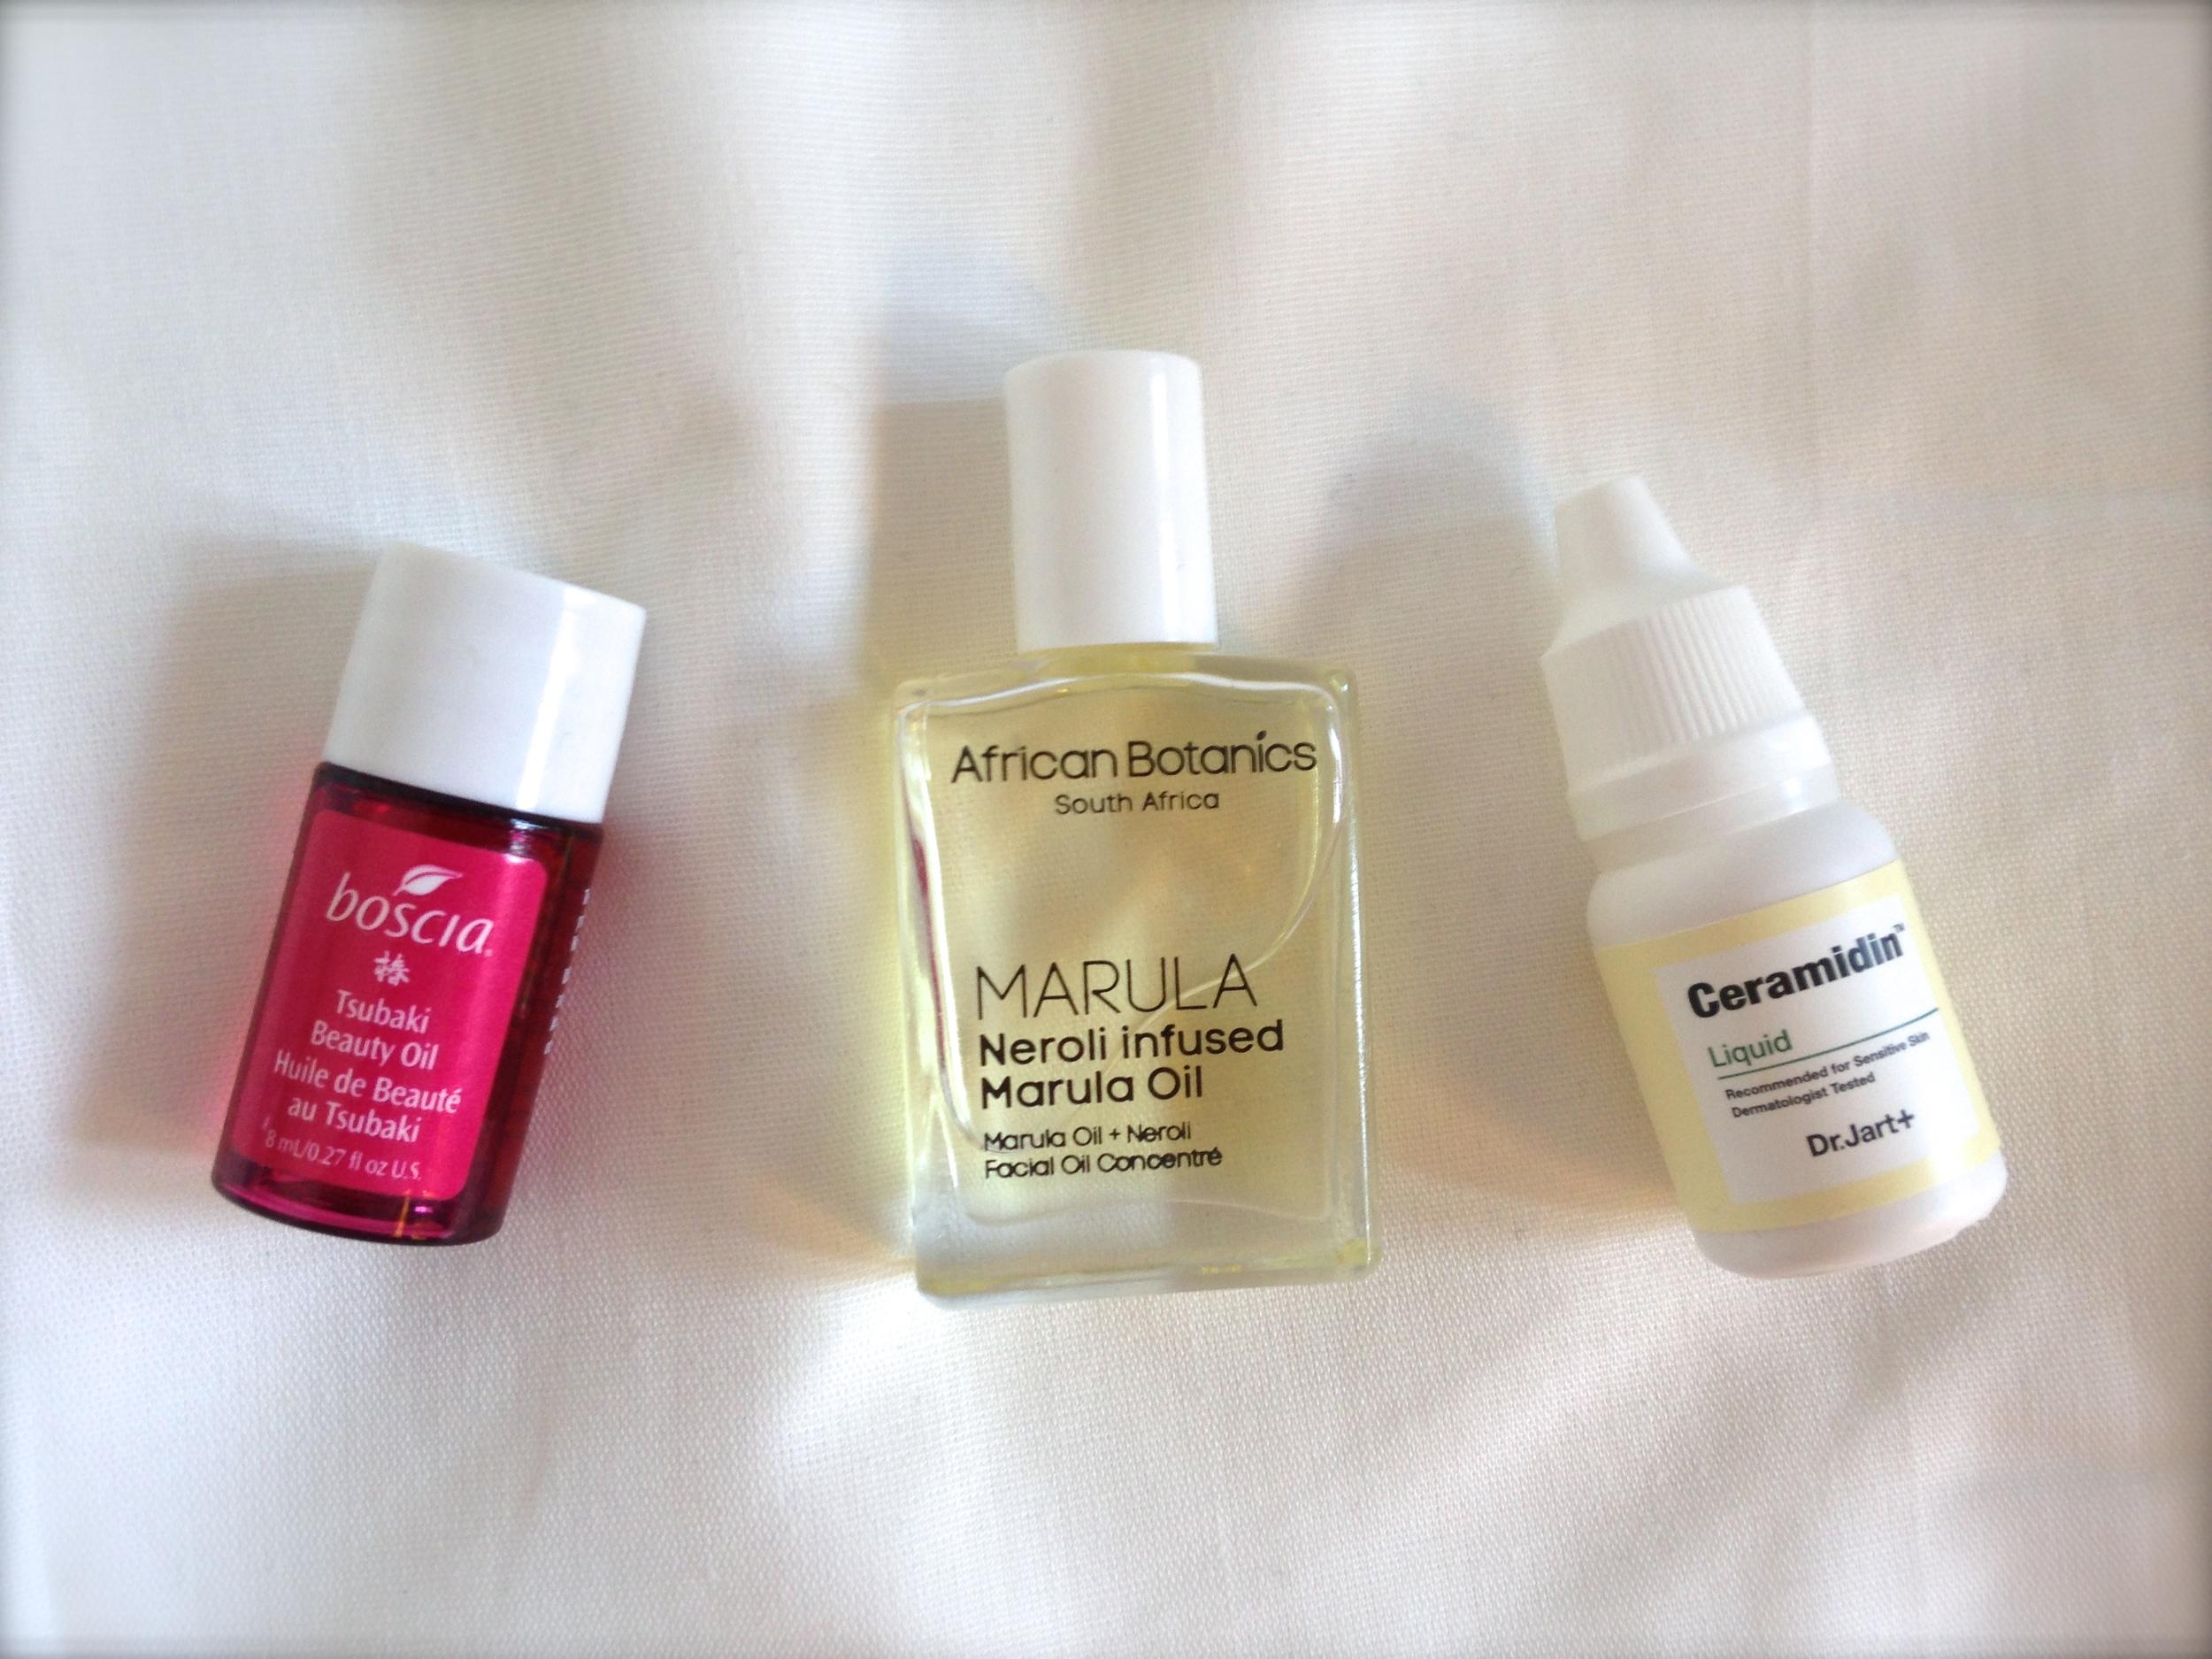 boscia tsubaki beauty oil review, african botanics neroli infused marula oil review, dr jart ceramidin liquid review